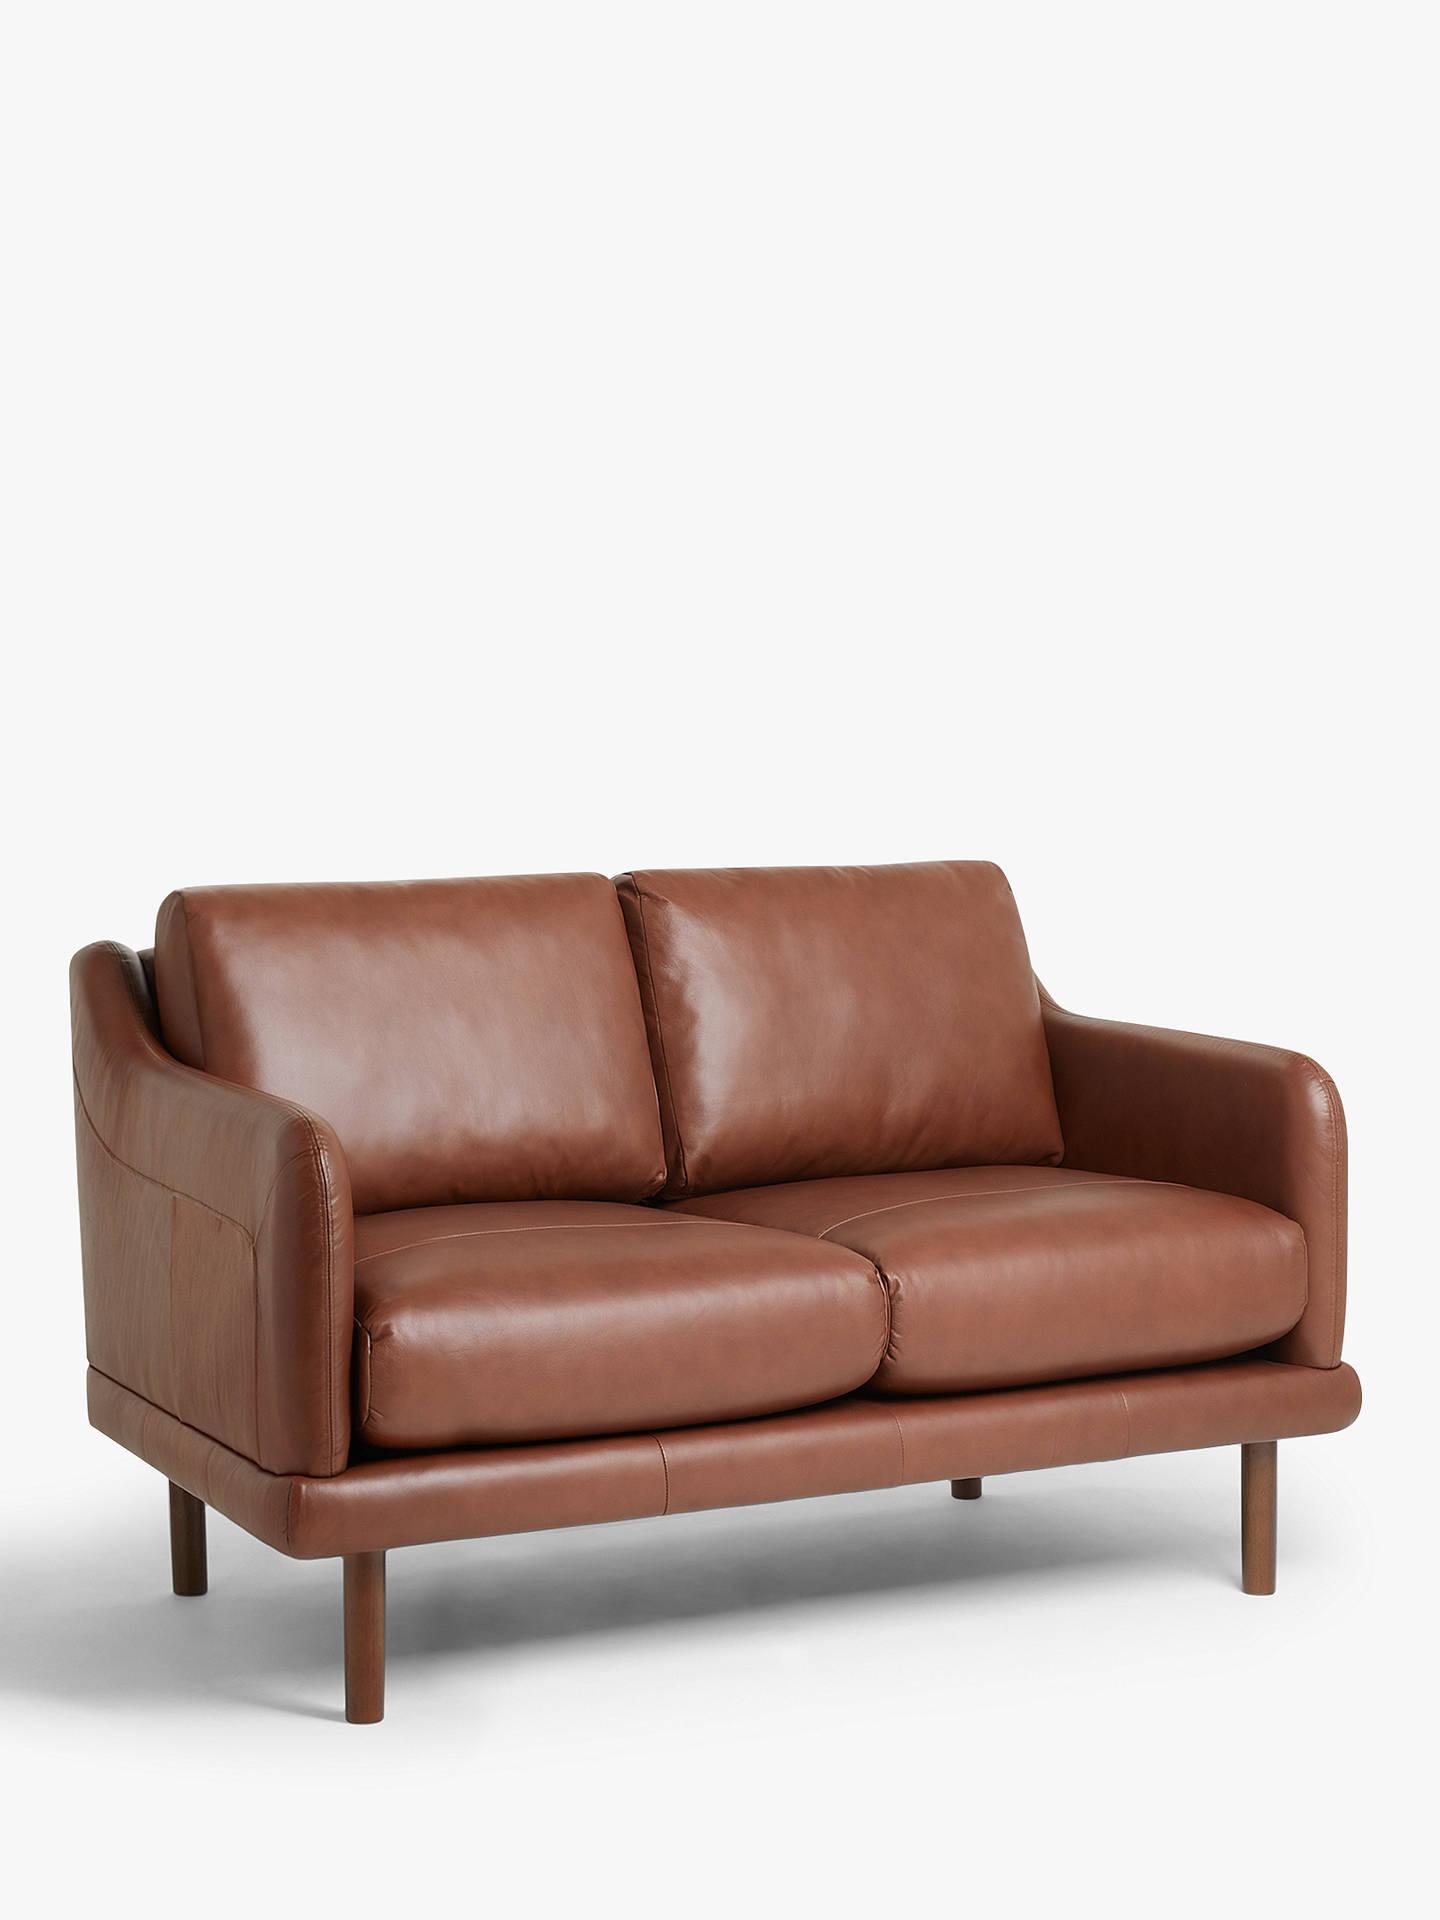 House by John Lewis Sweep Small 2 Seater Leather Sofa, Dark Leg, Contempo  Castanga